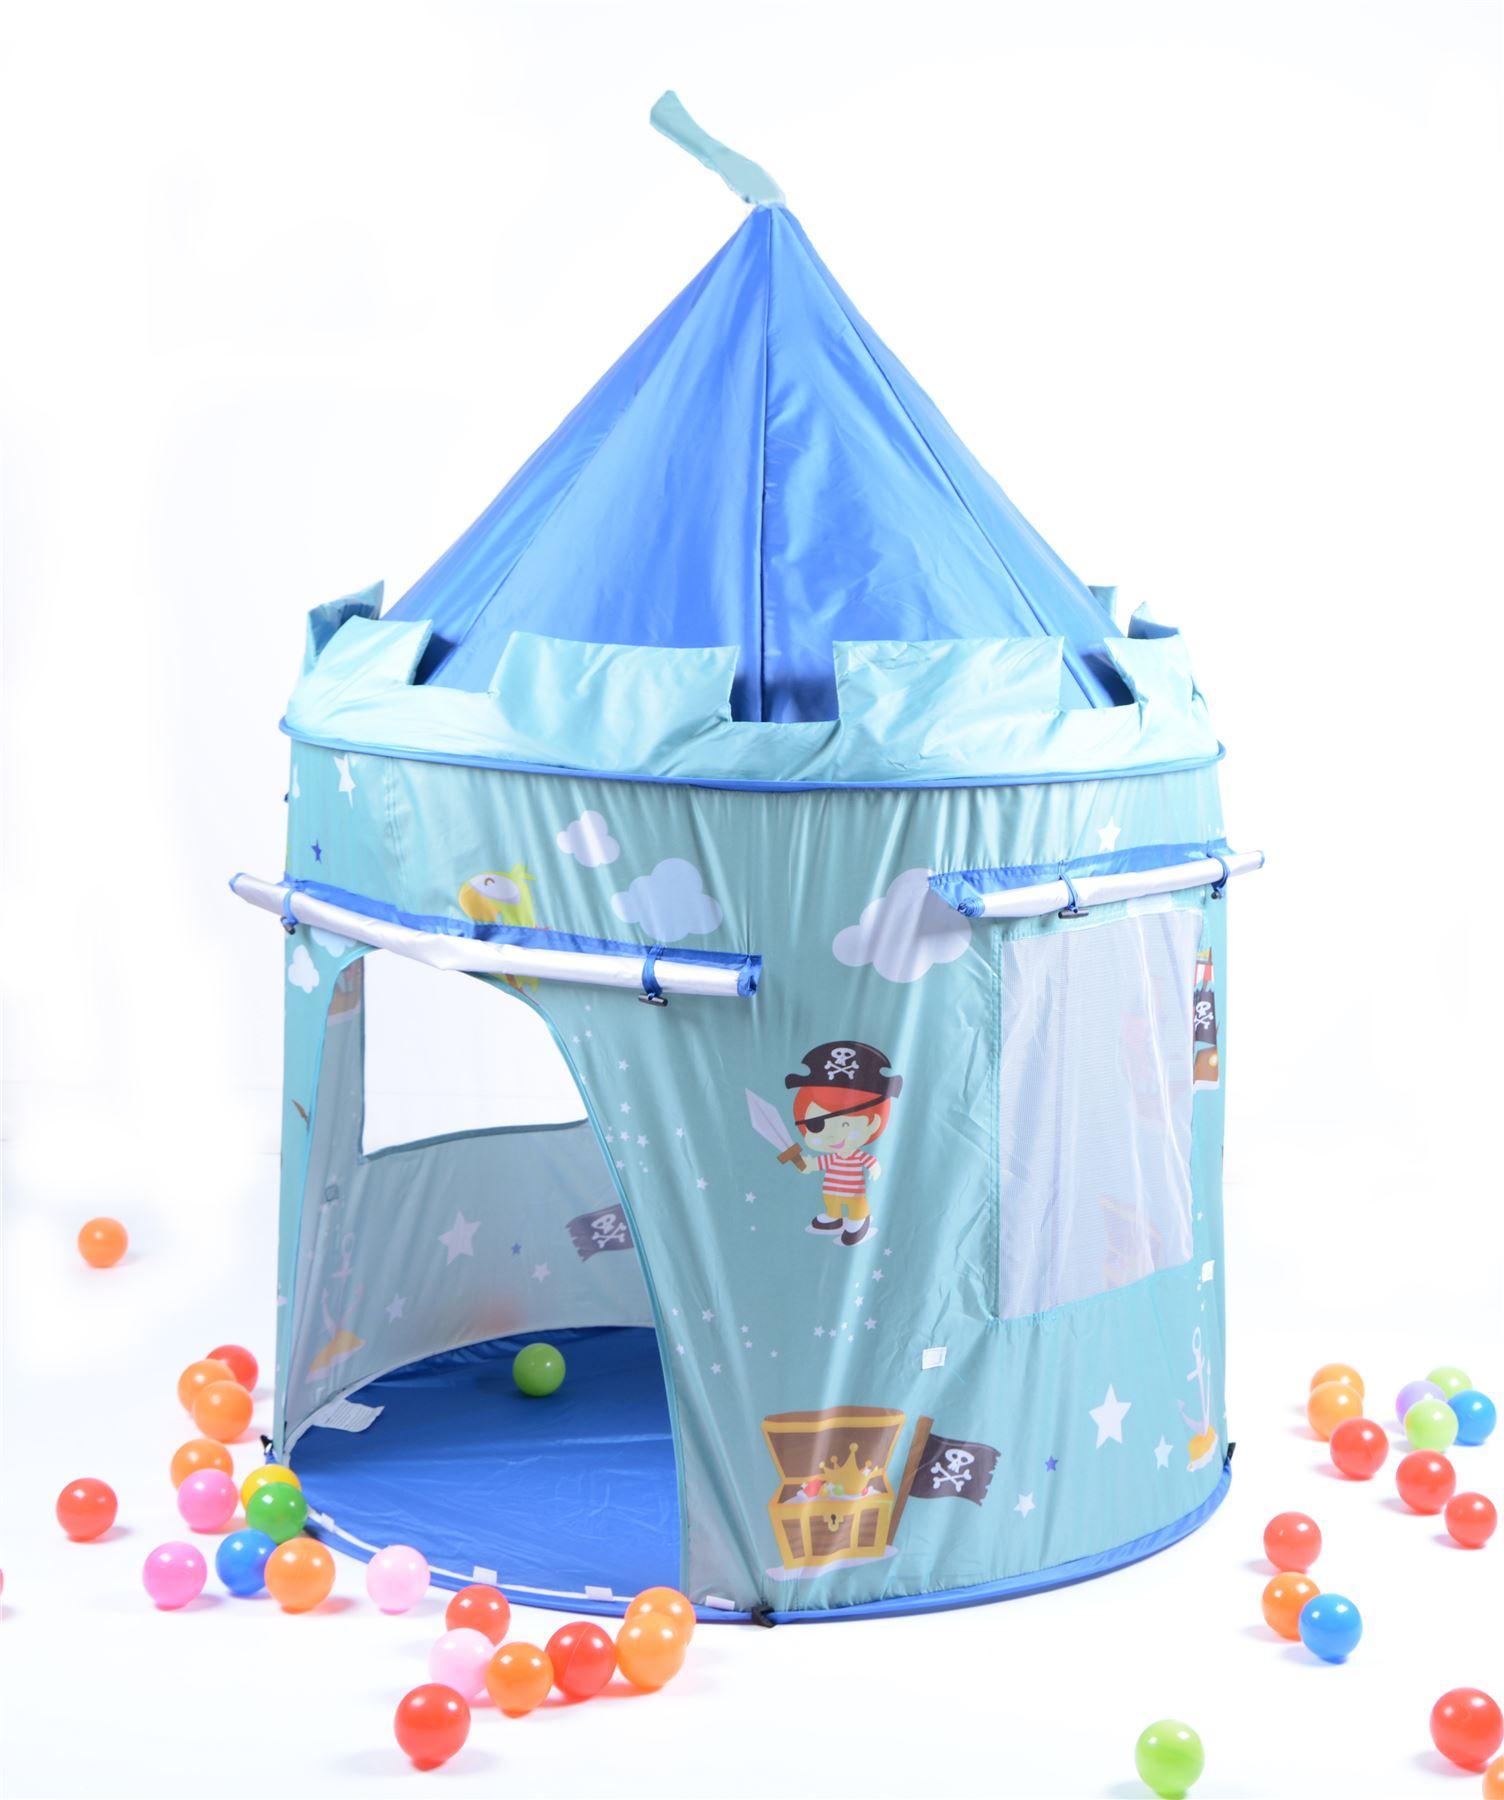 pirate children kids blue indoor outdoor pop up play tent fun playhouse ebay. Black Bedroom Furniture Sets. Home Design Ideas